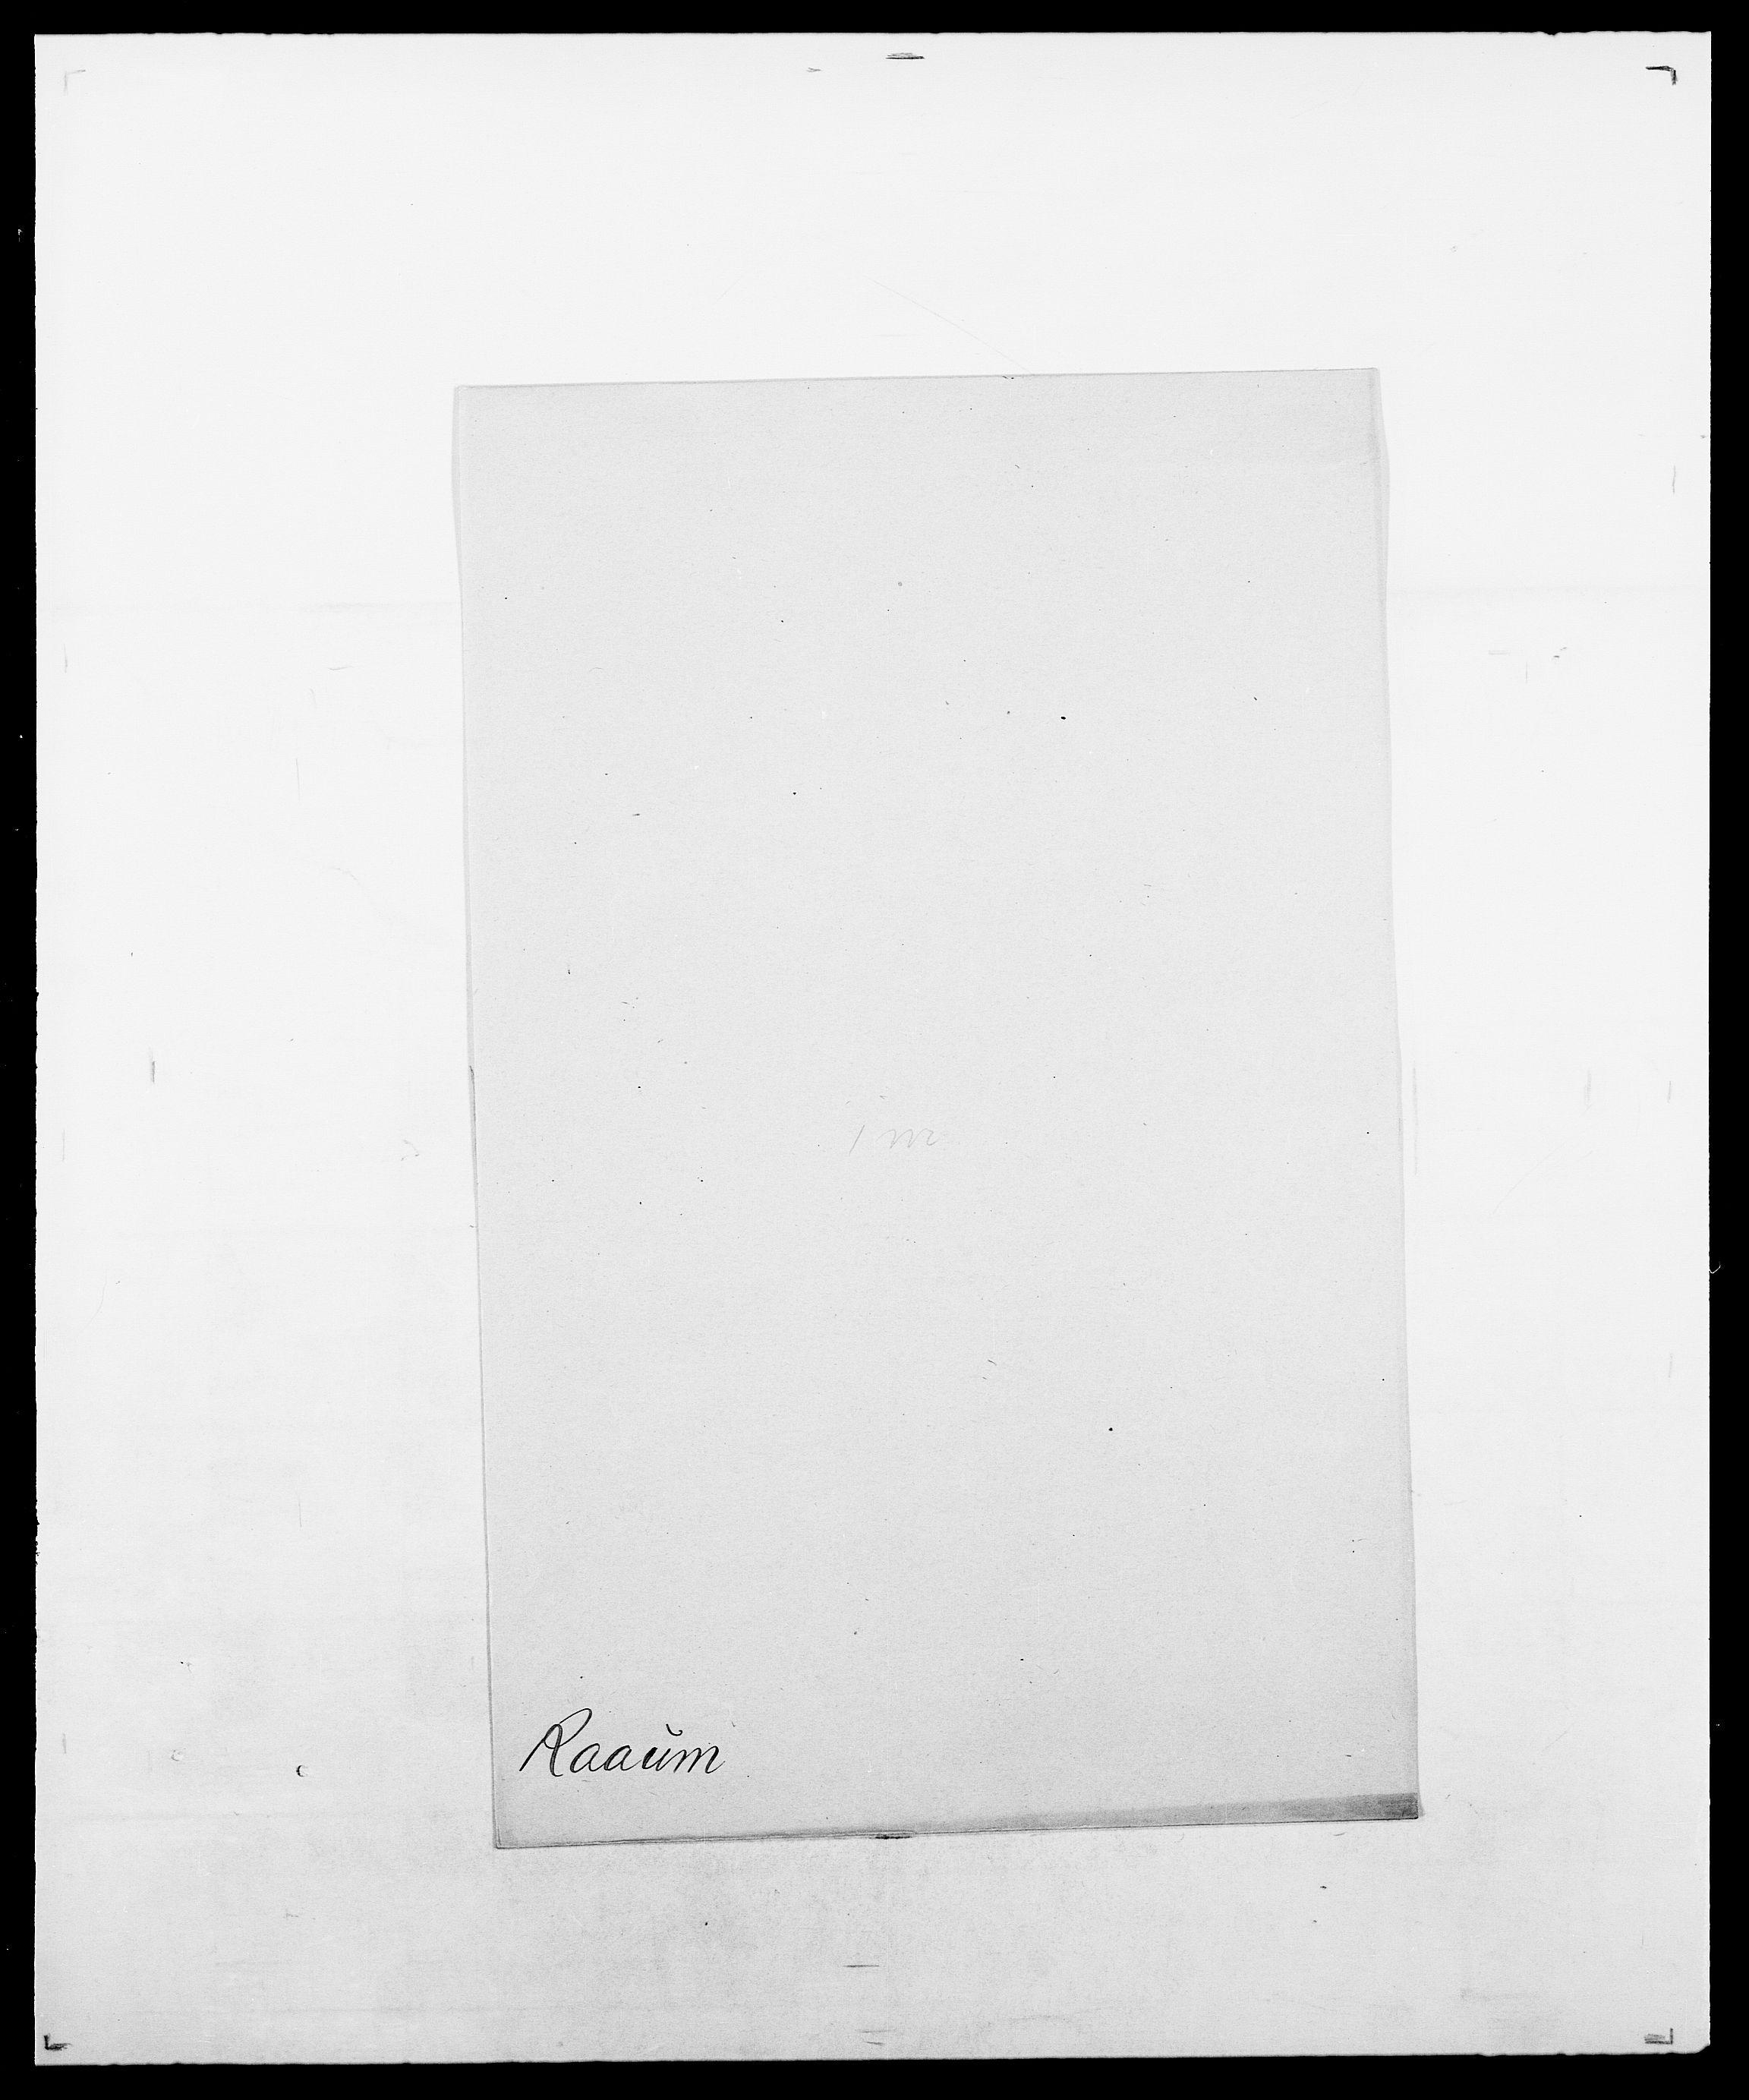 SAO, Delgobe, Charles Antoine - samling, D/Da/L0031: de Place - Raaum, s. 539